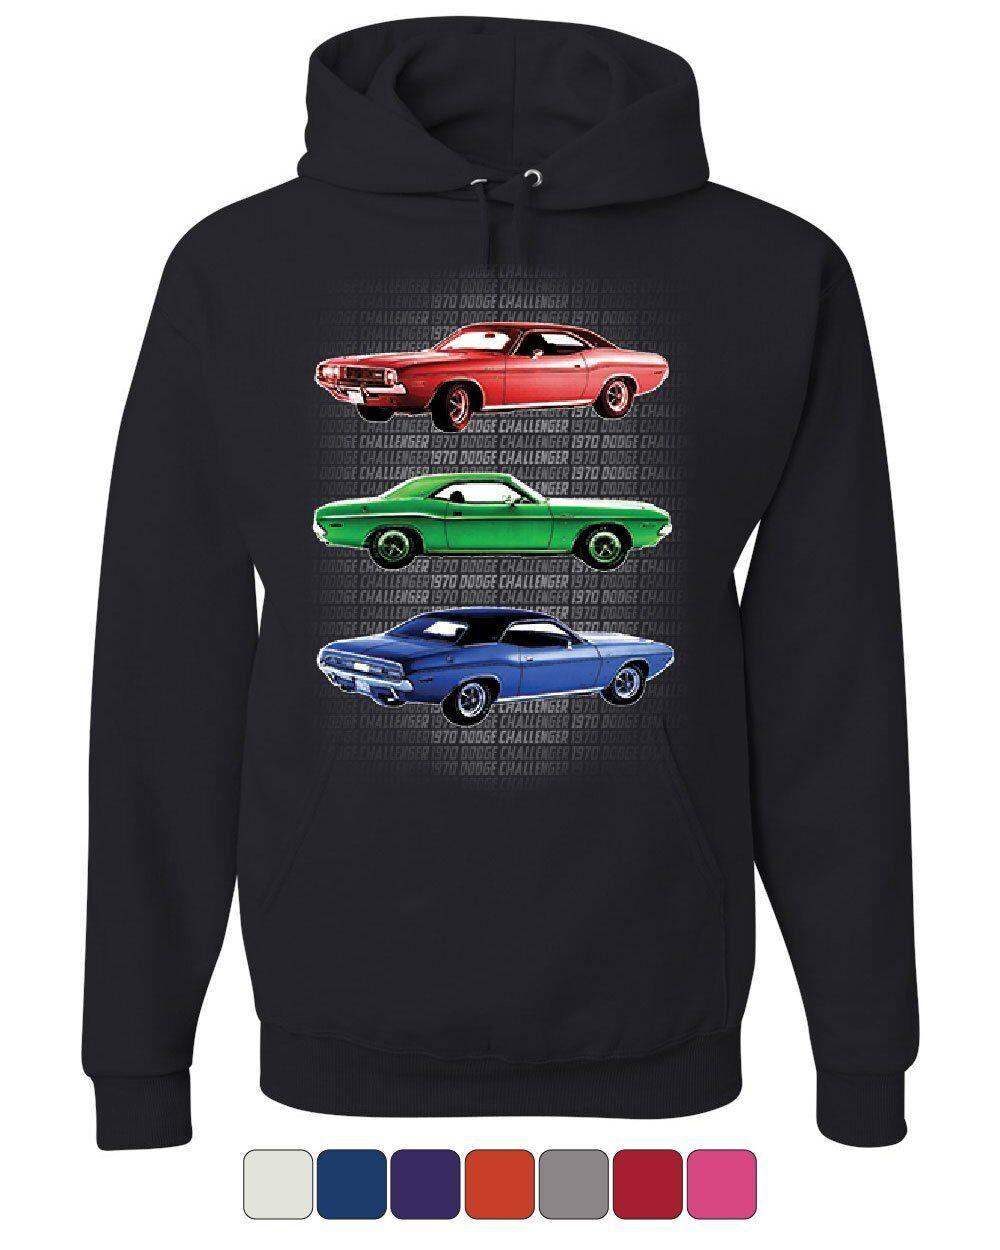 1970 Dodge Challenger Hoodie 1st Gen T A Classic Muscle Car Sweatshirt